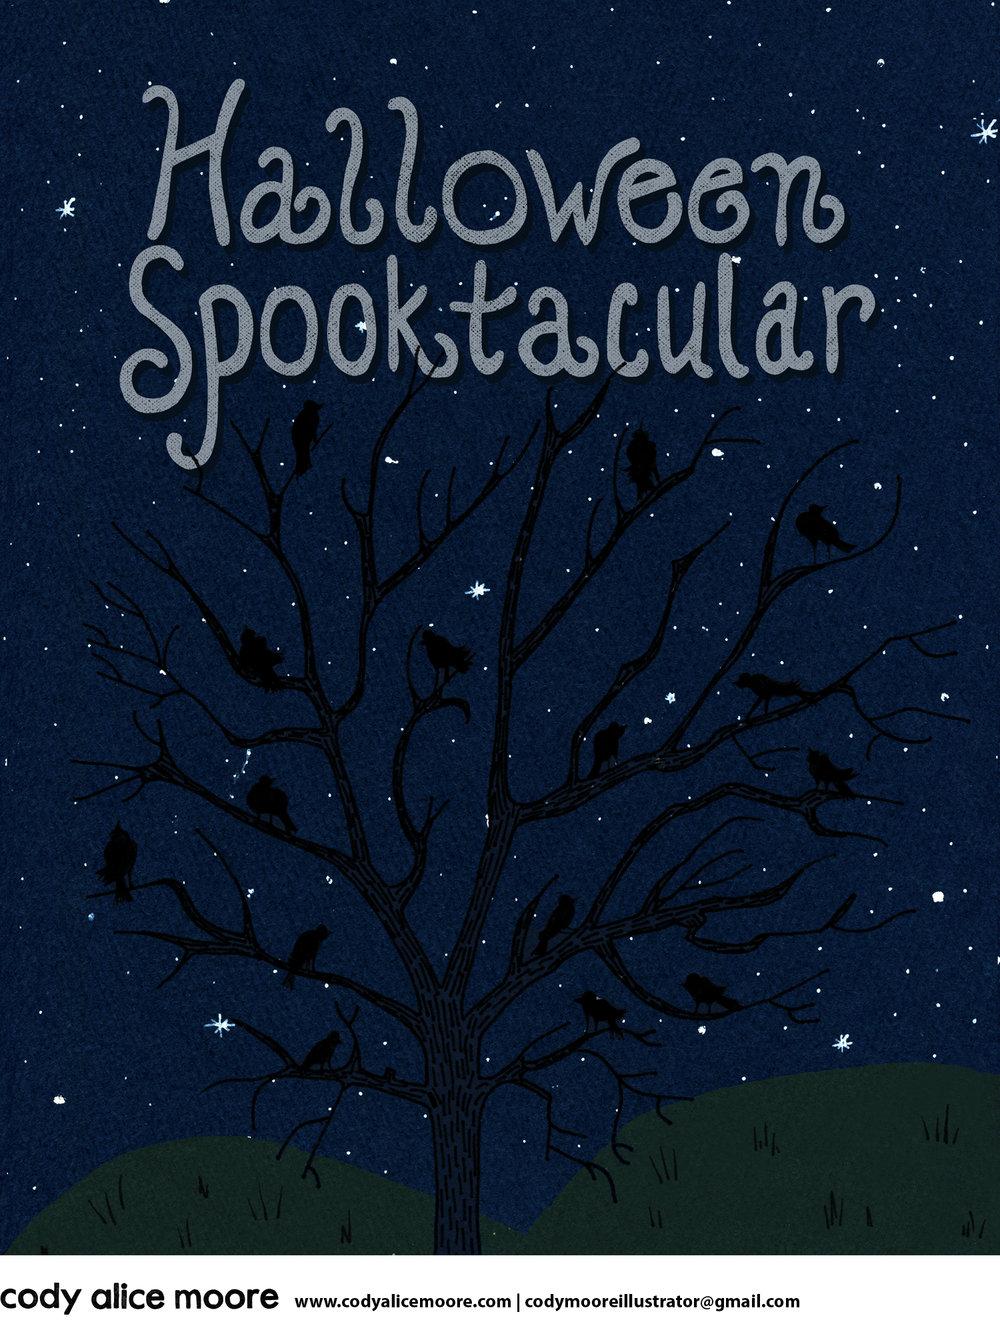 CodyAliceMoore_HalloweenSpooktacular